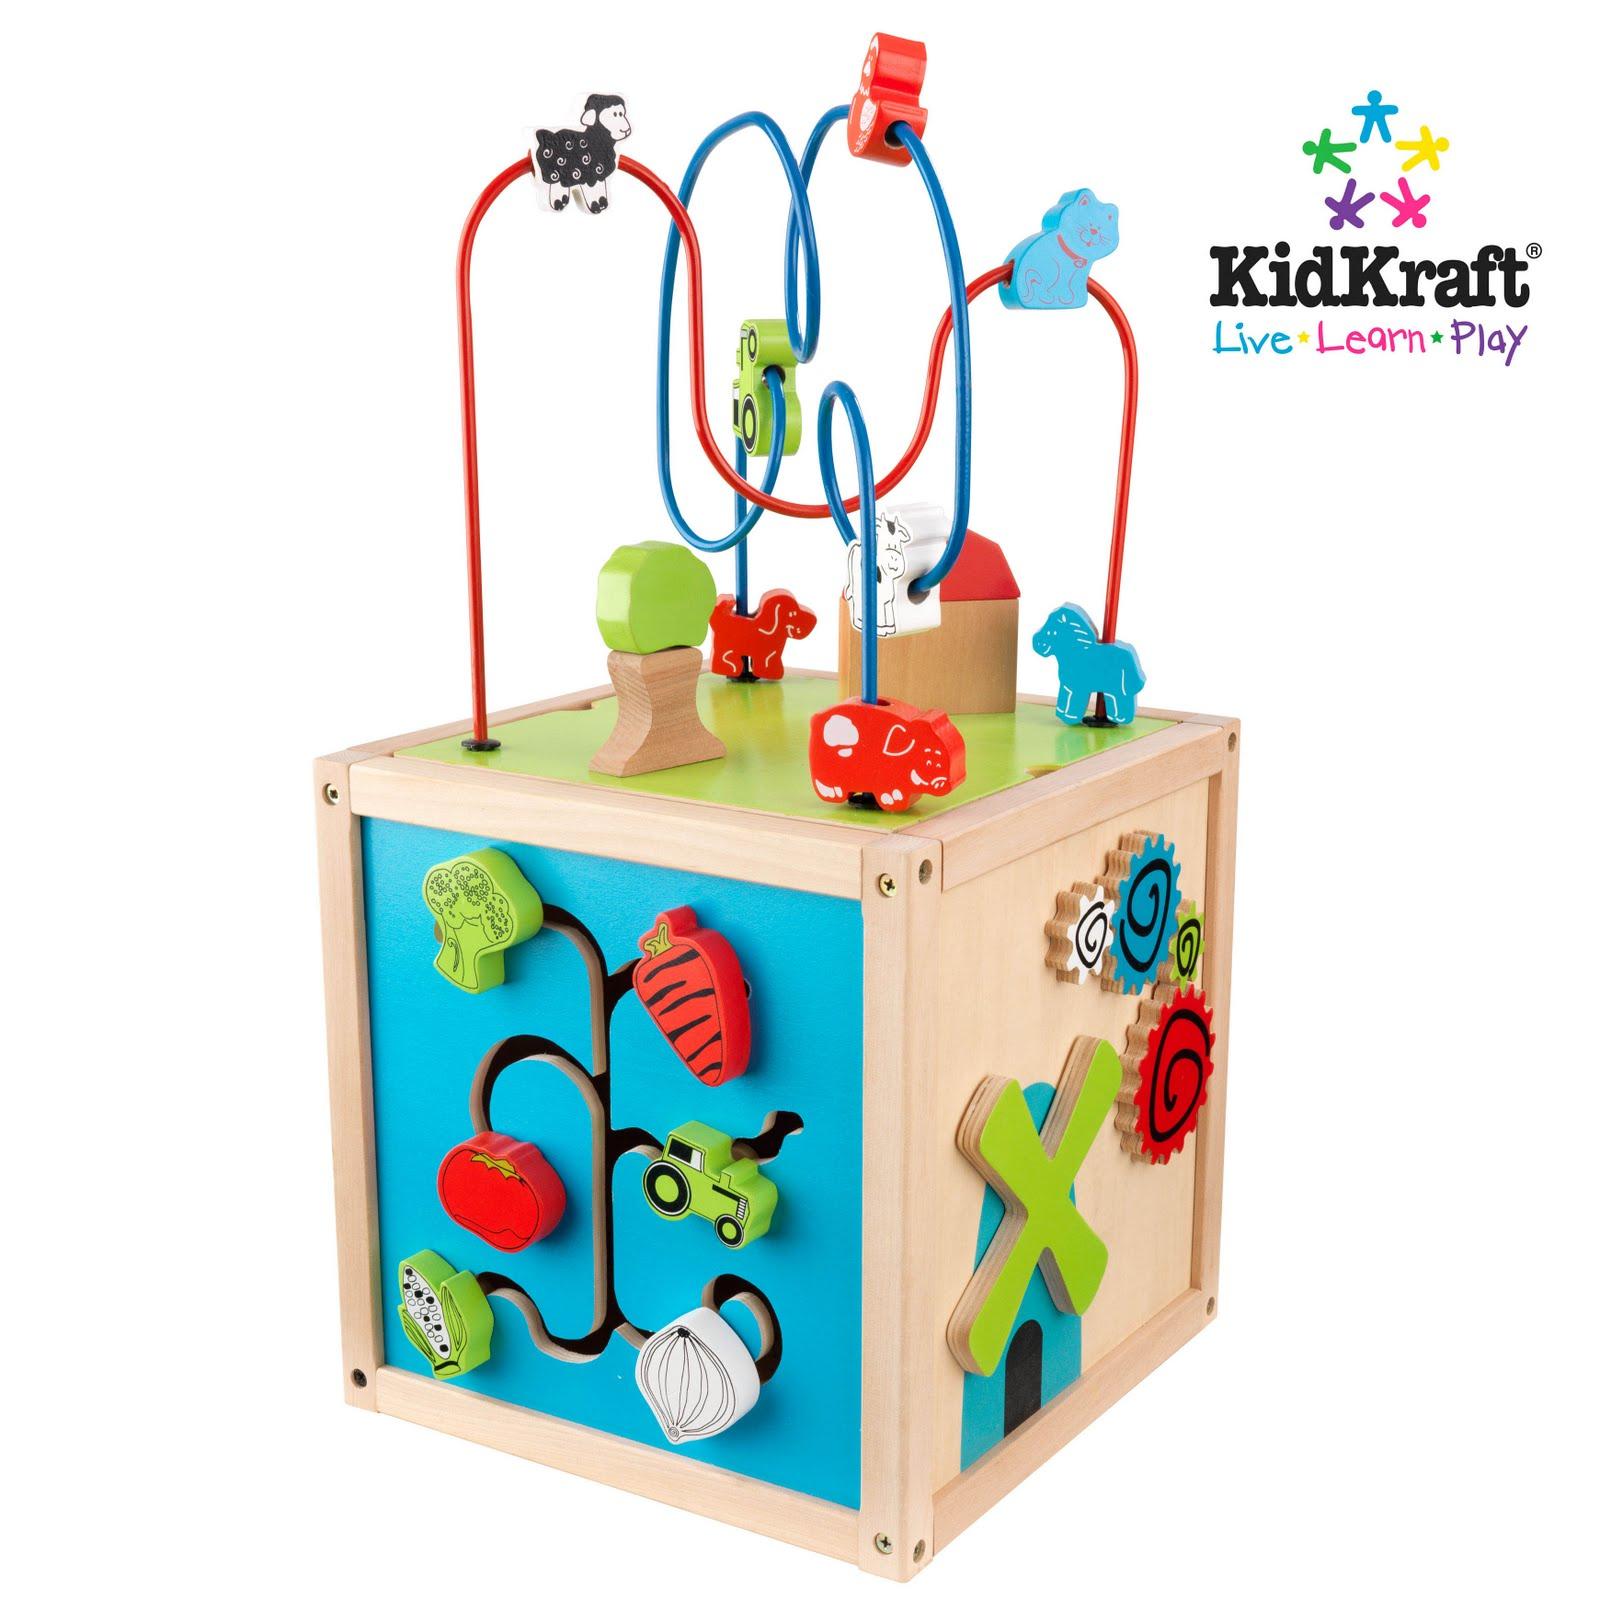 Kidkraft Kitchen Reviews